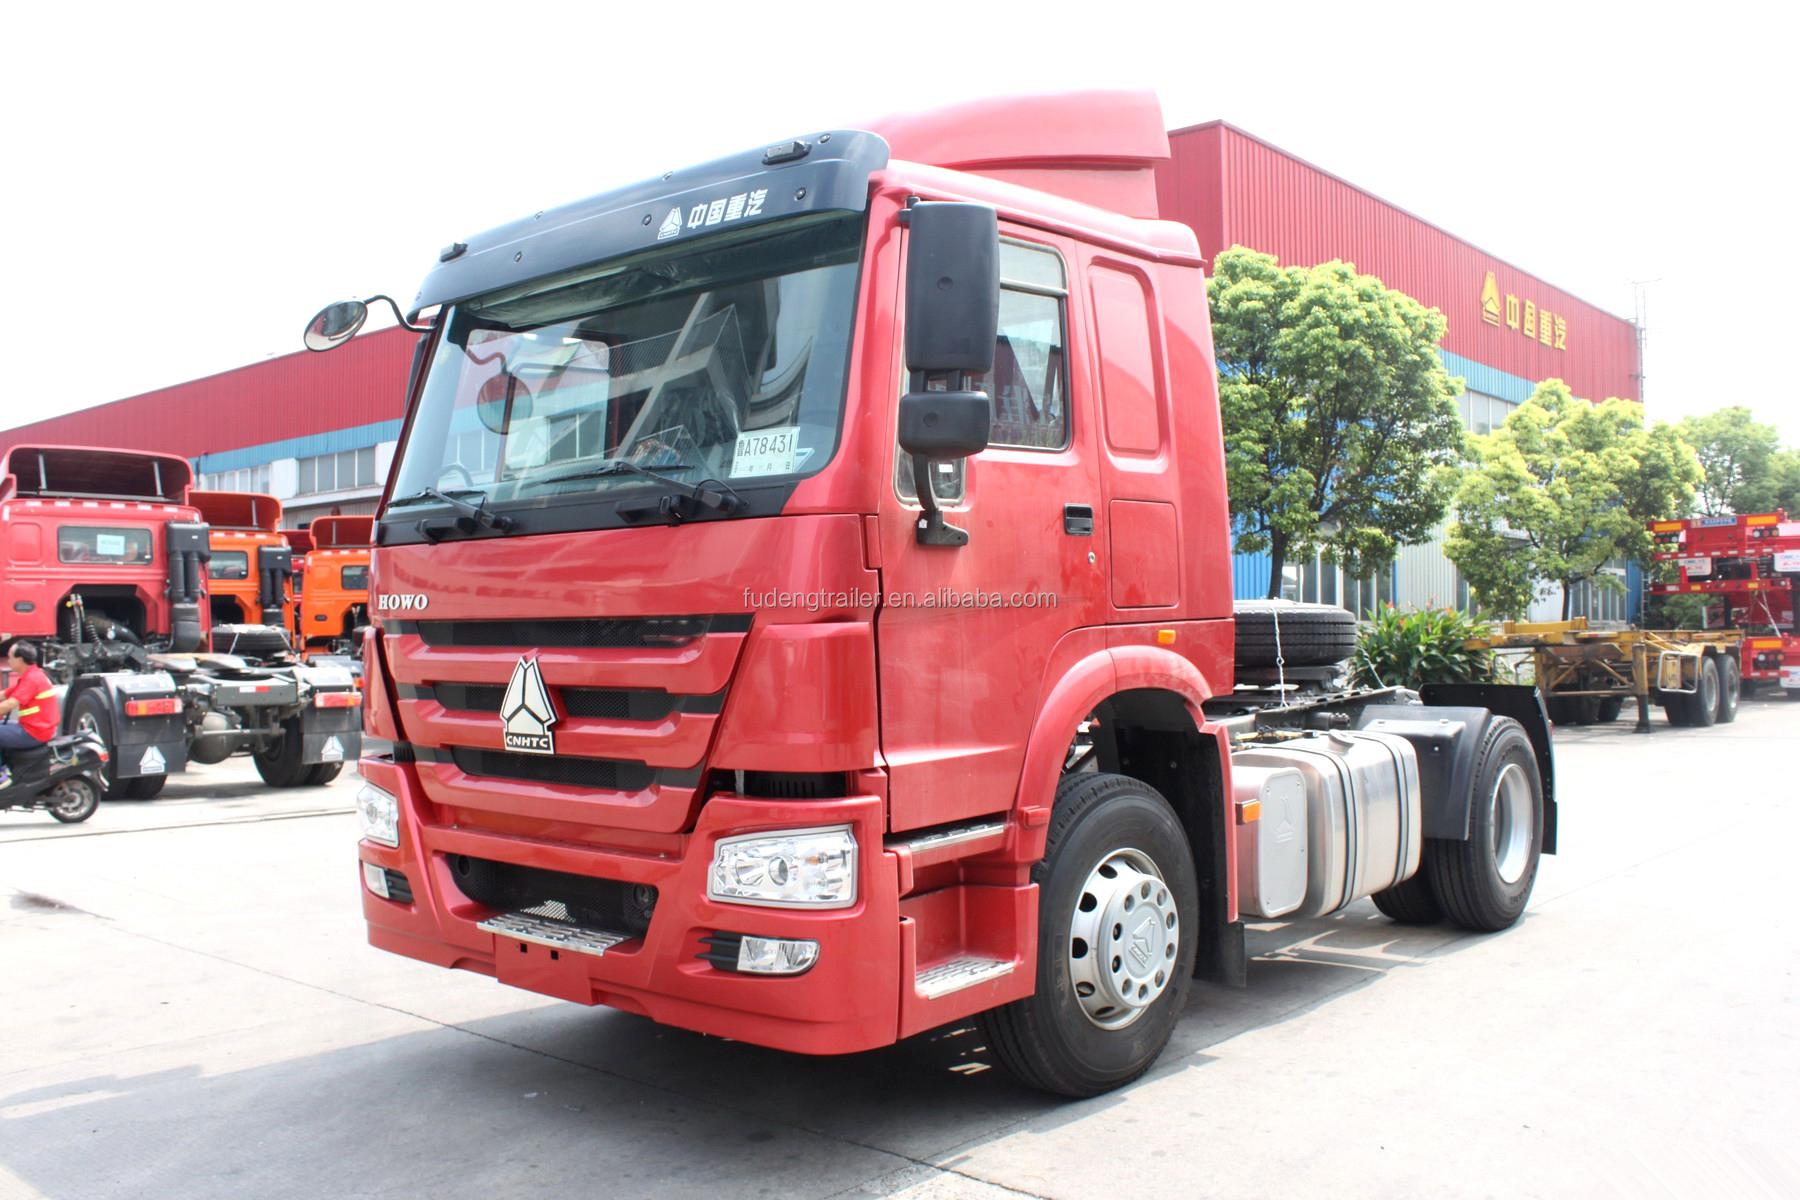 Goede prijs Howo 420 paard power truck hoofd te koop